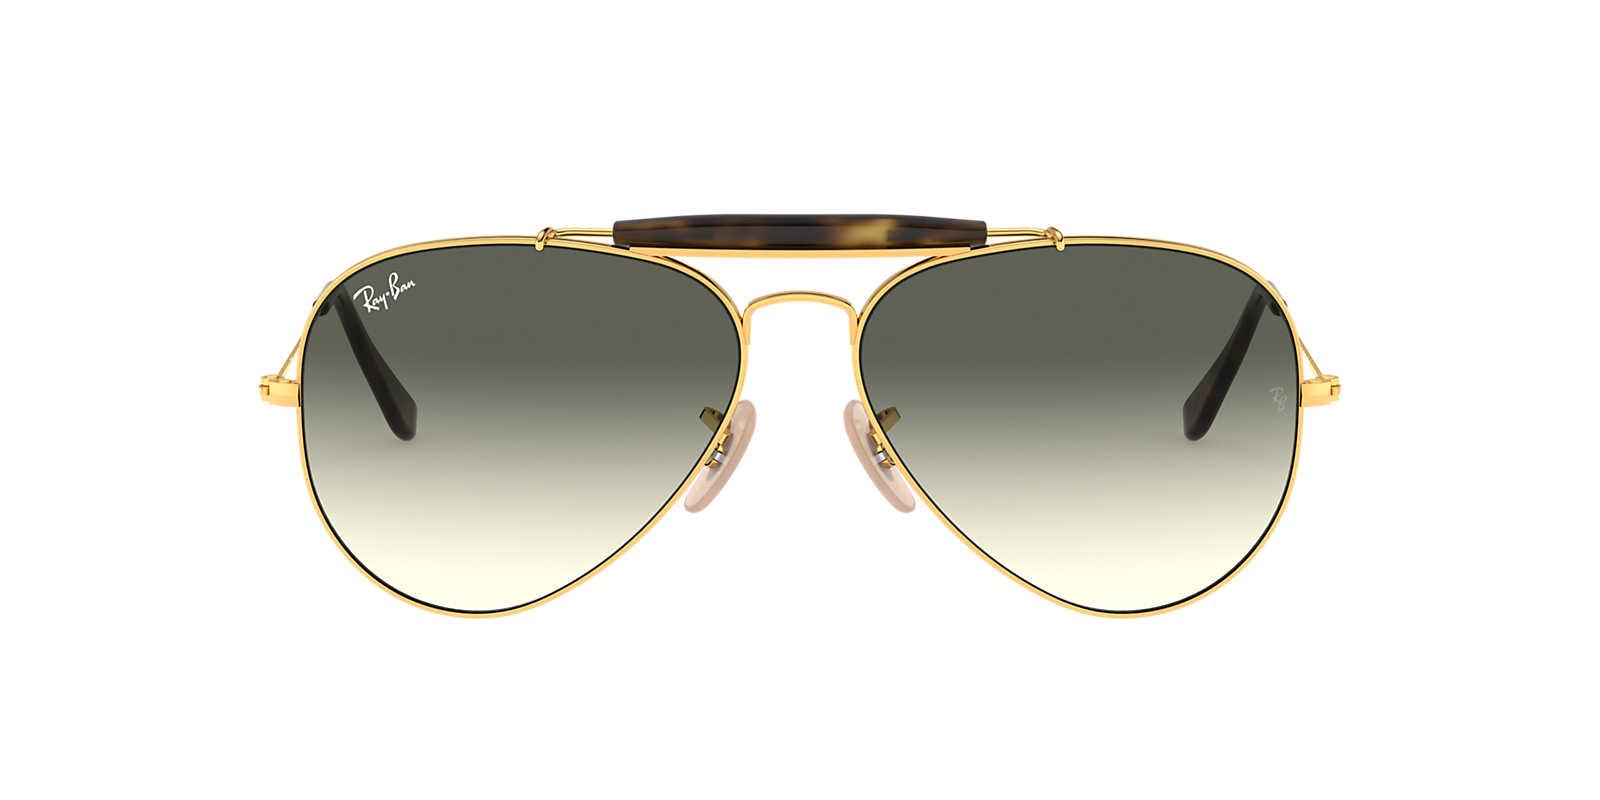 ray ban lennon  Ray-Ban RB3029 62 OUTDOORSMAN II 62 Grey \u0026 Gold Sunglasses ...